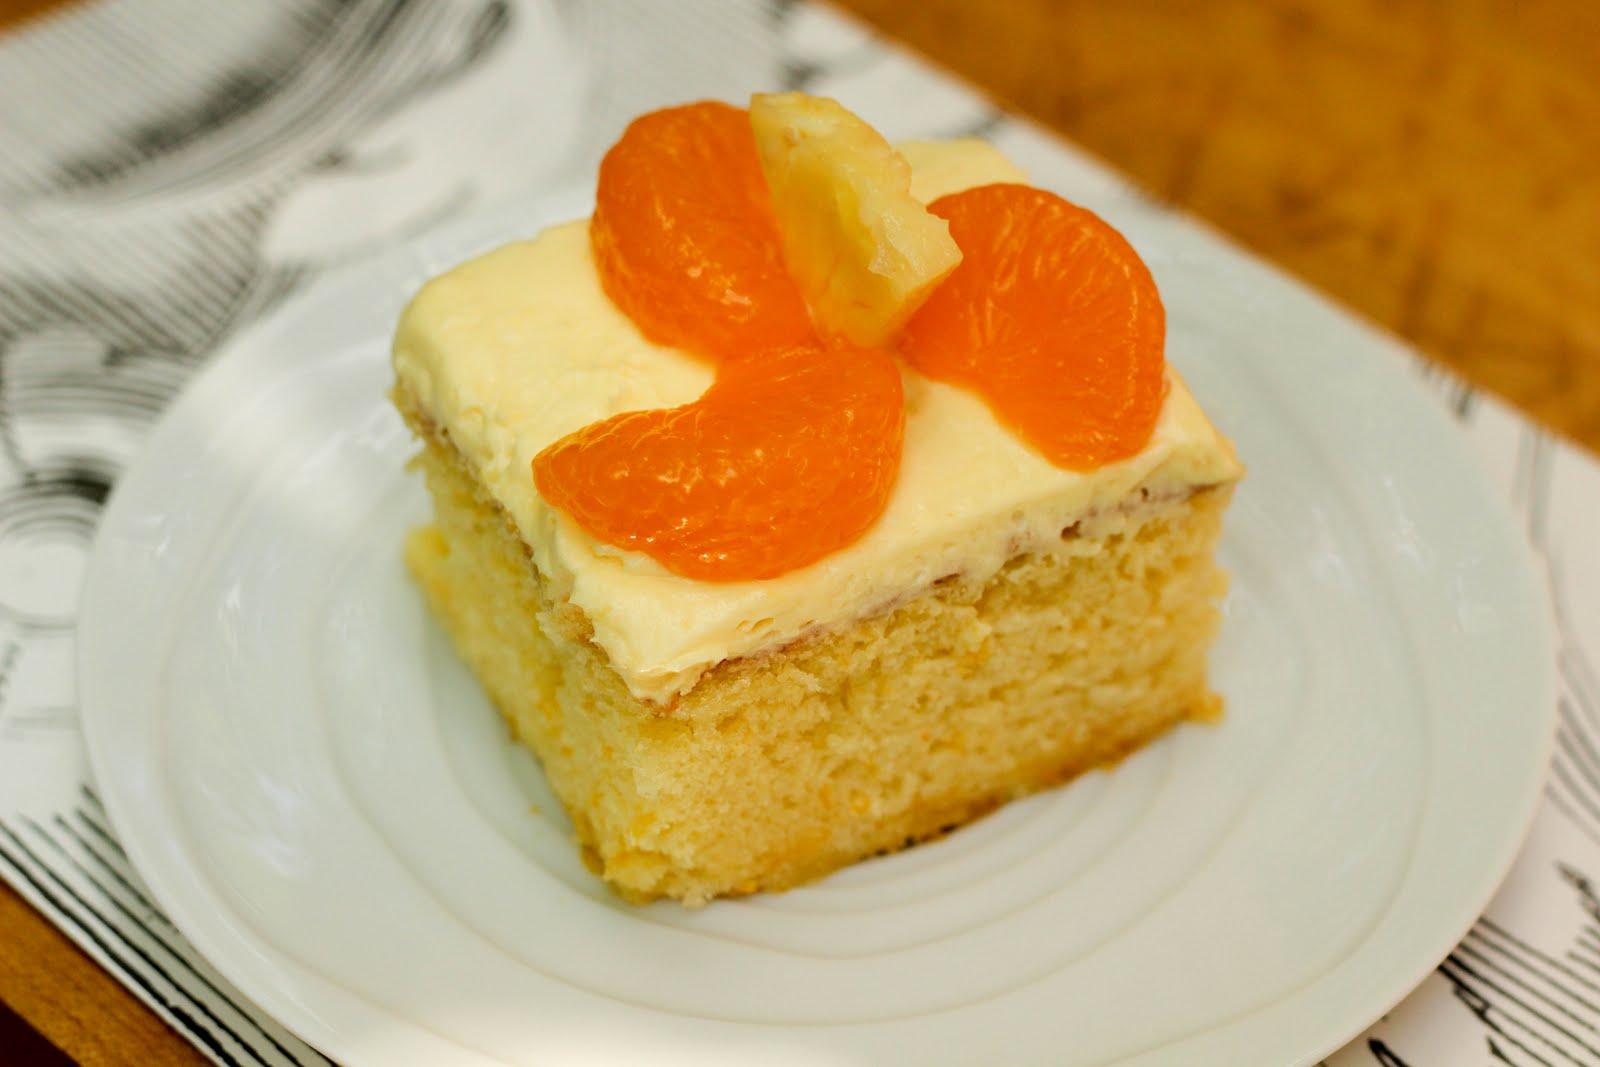 Cake Recipe With Mandarin Oranges And Pineapple